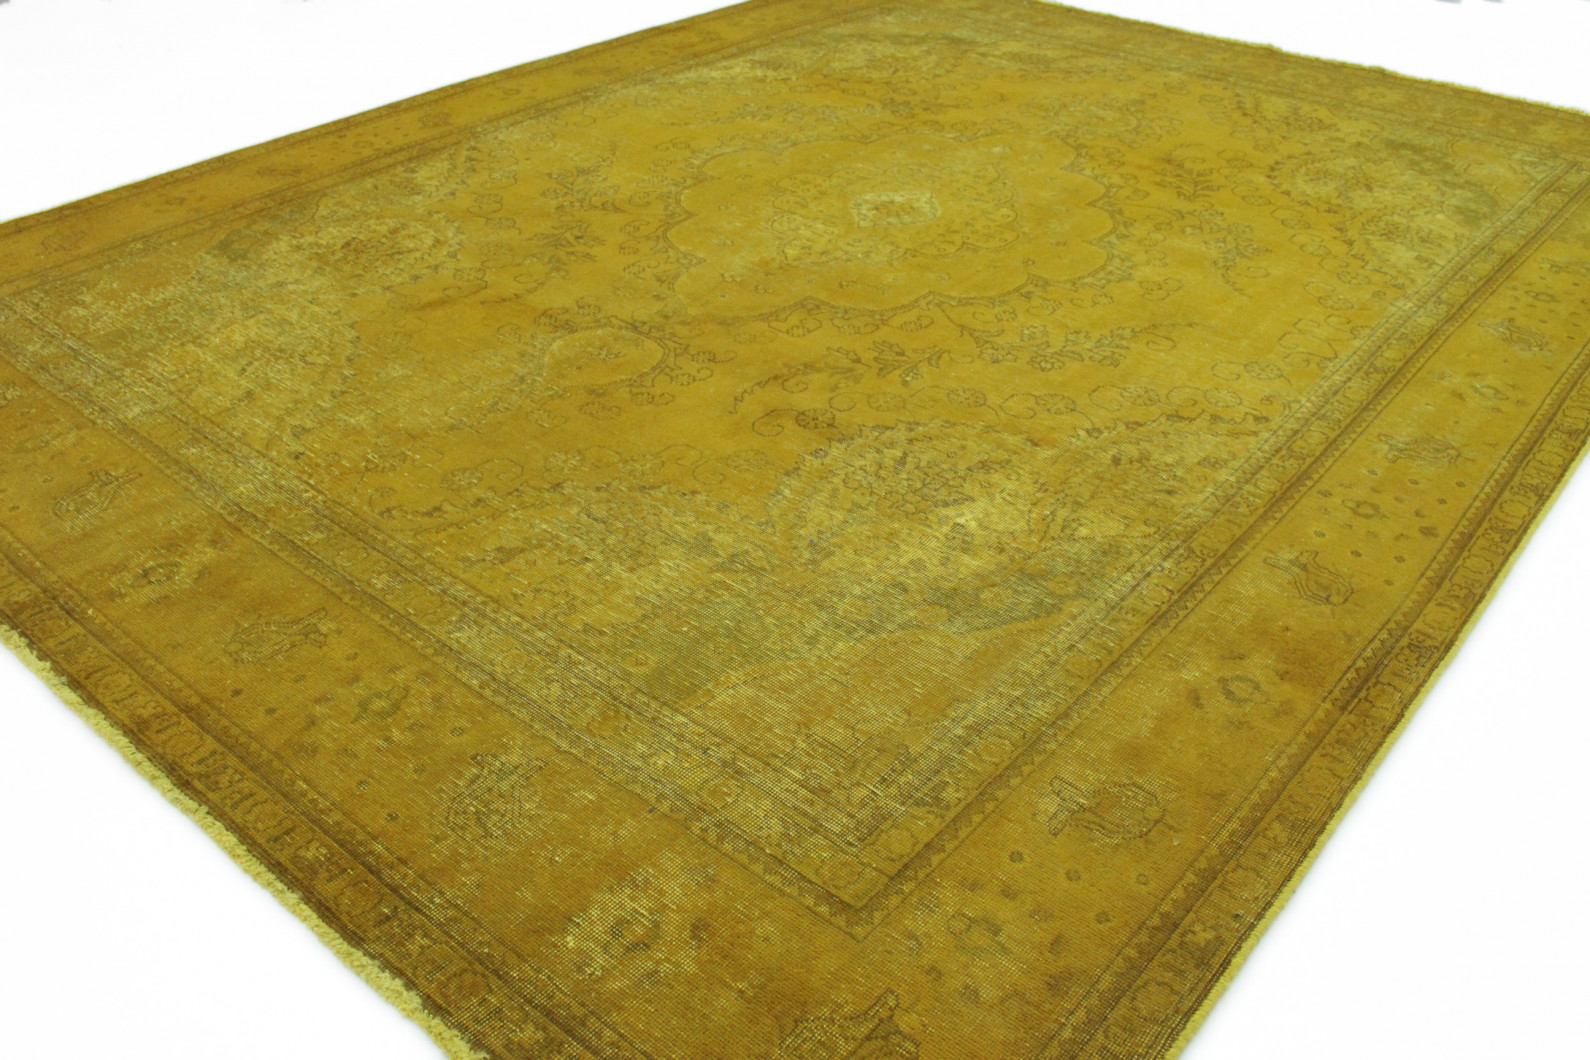 vintage teppich gelb gold in 390x290 1001 167010 bei. Black Bedroom Furniture Sets. Home Design Ideas